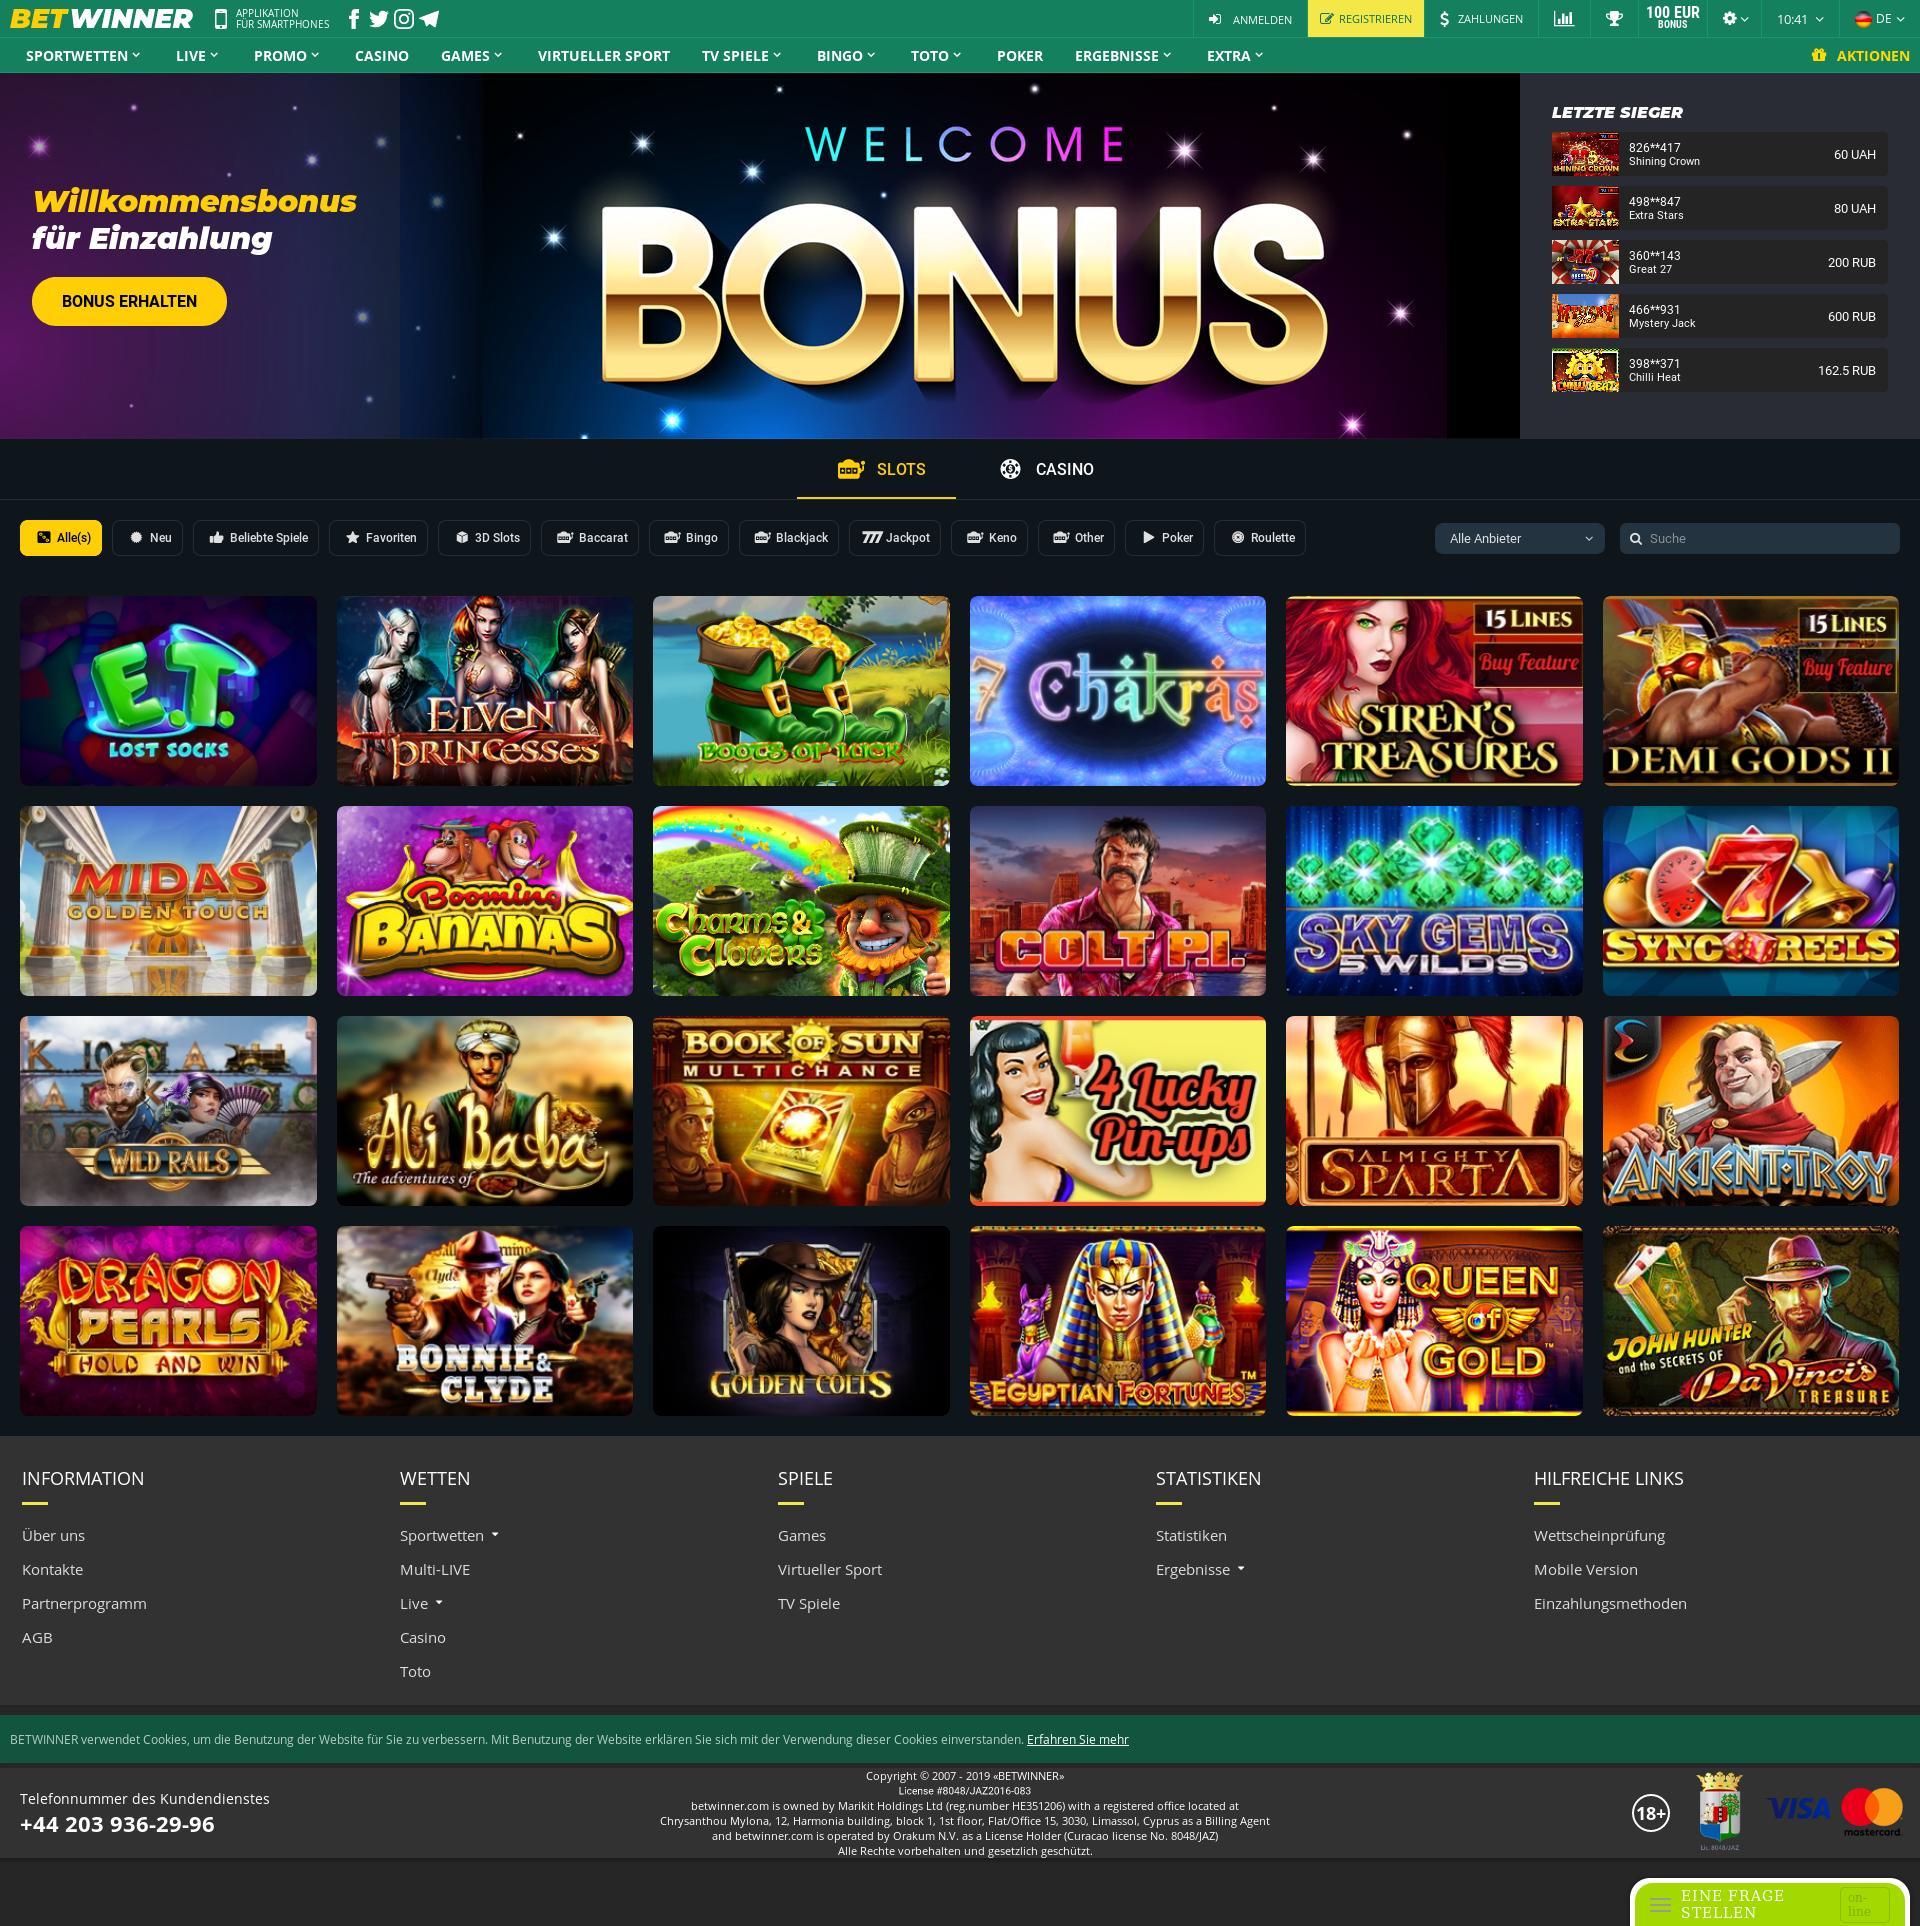 Casino screen Lobby 2019-07-22 for Germany